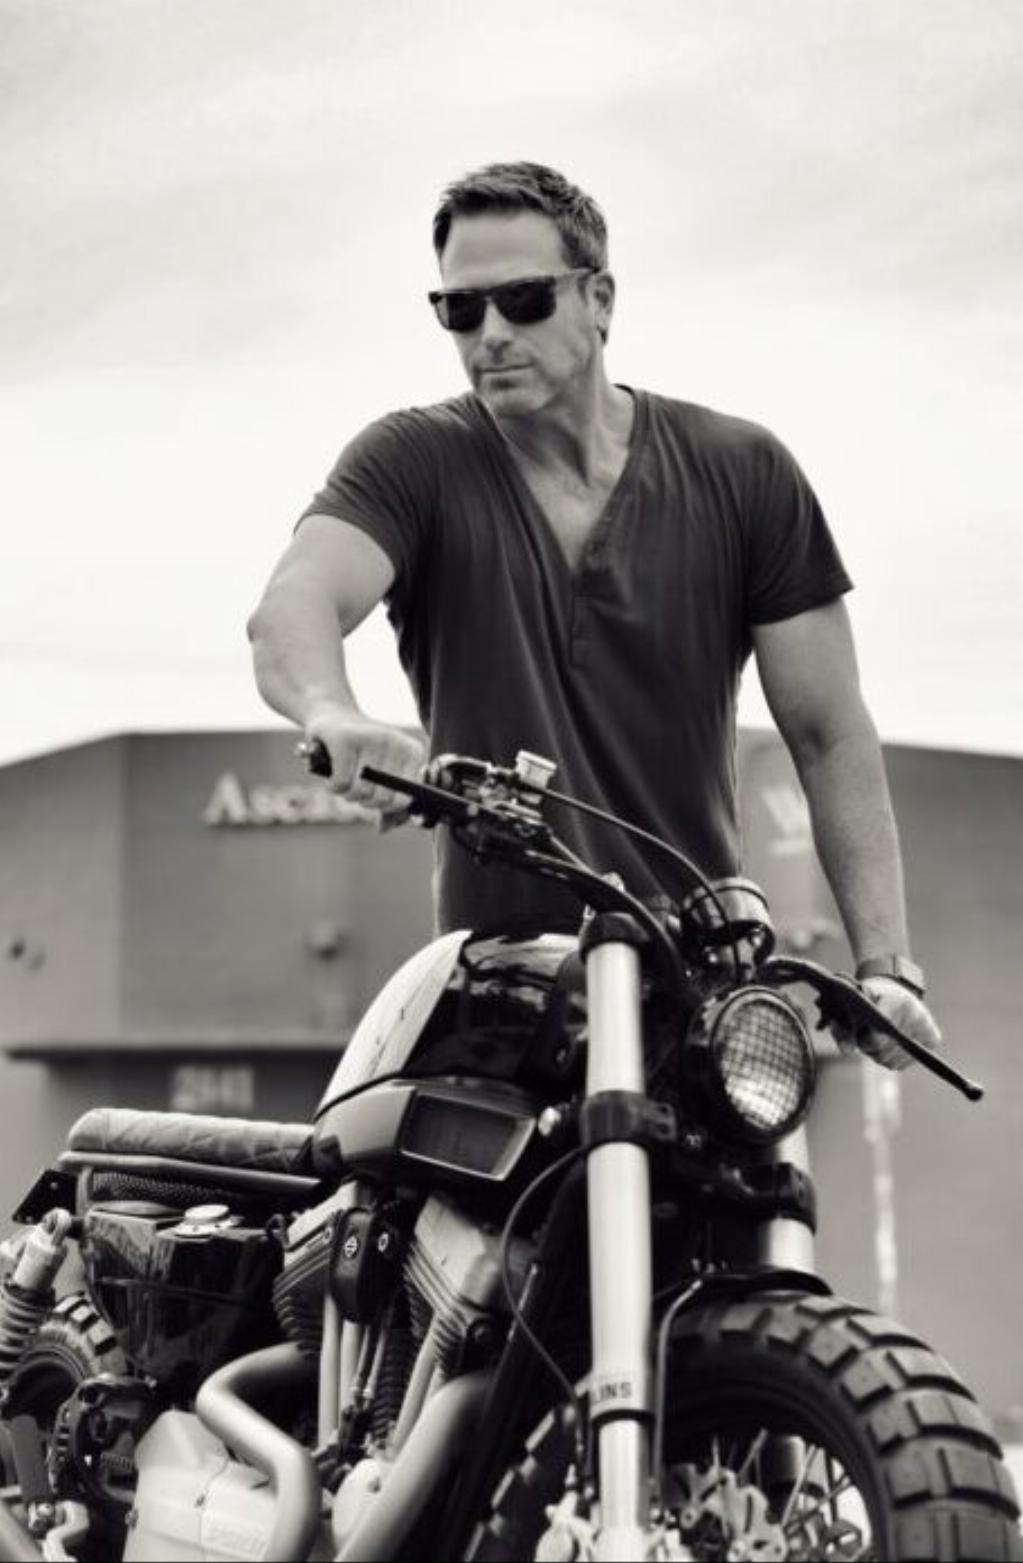 Jason-McAlister-Miami-Male-Model-470x705.jpg